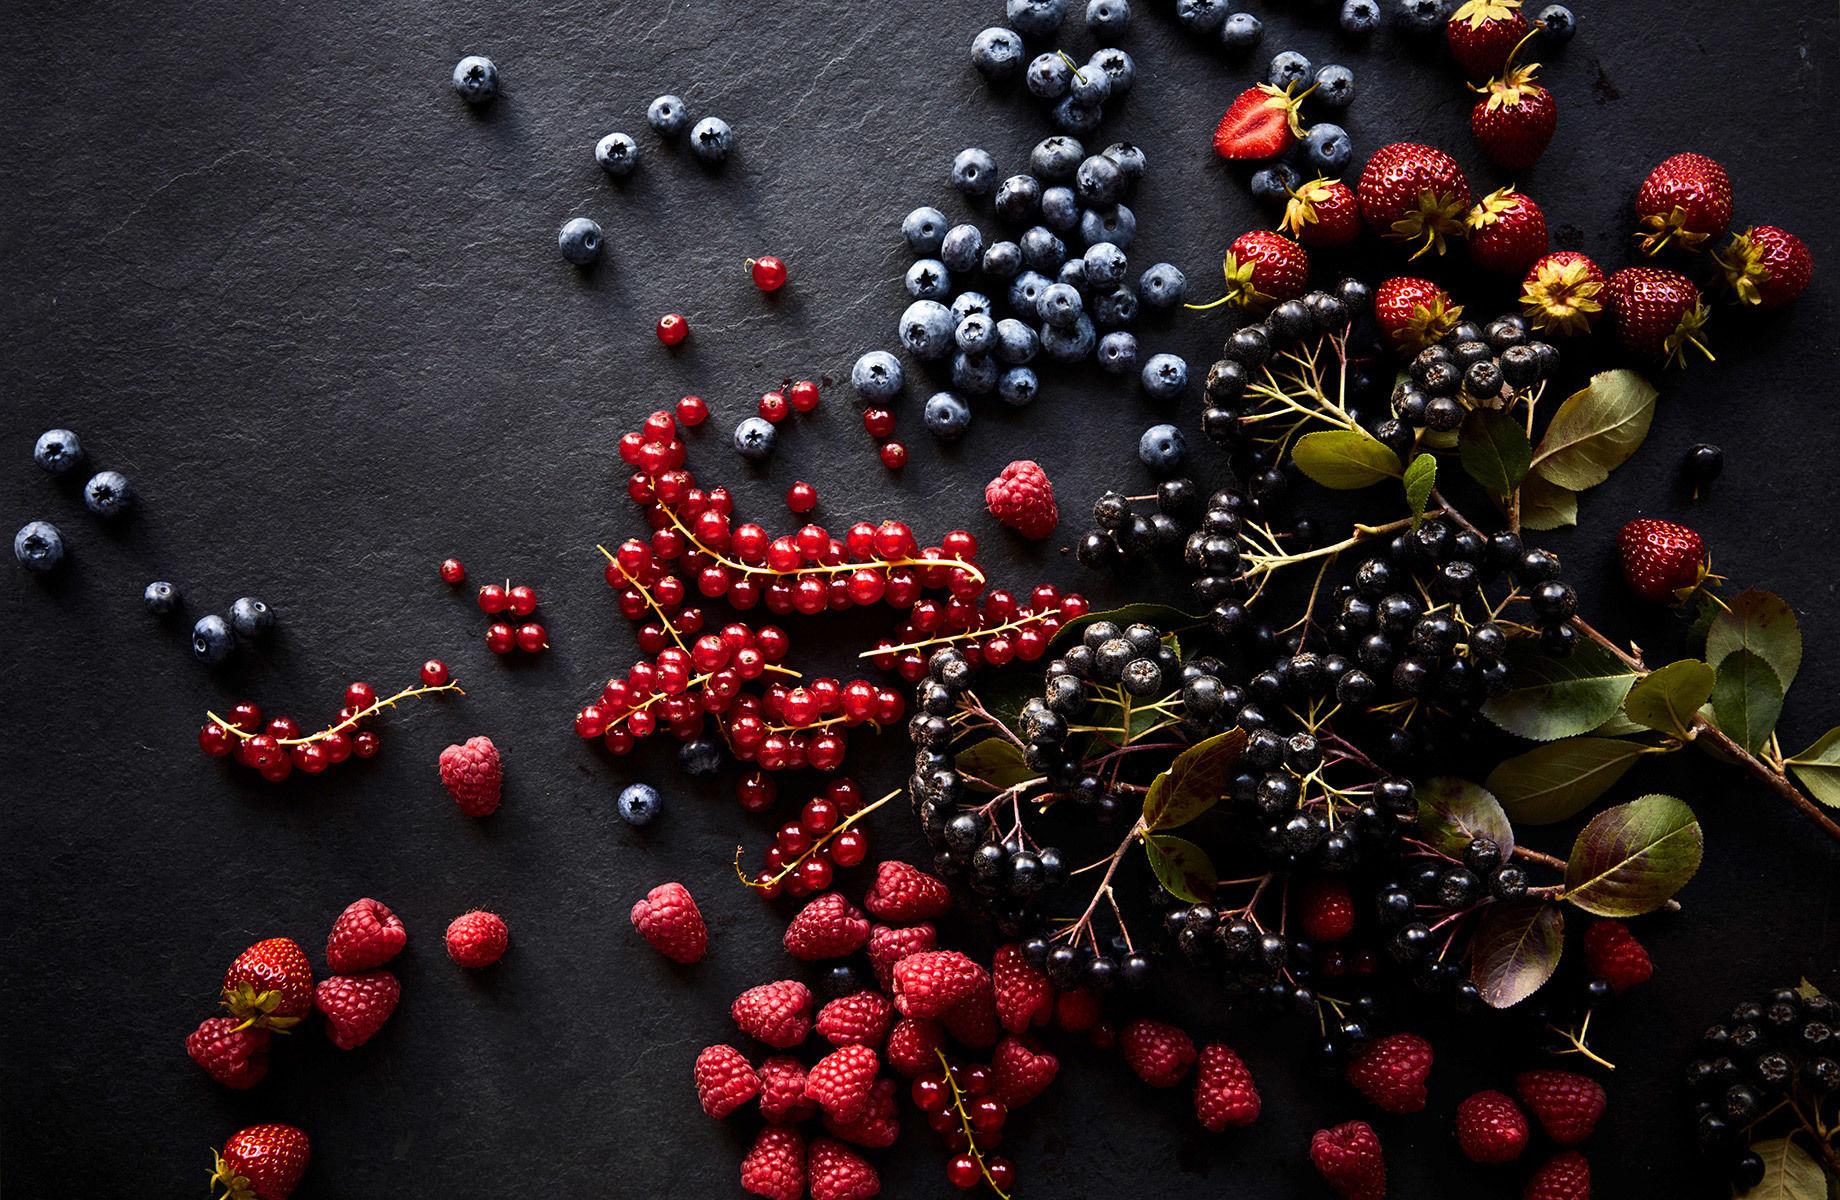 DOUBLE T PHOTOGRAPHERS: Marie-Therese Cramer - Salon Magazin: Perfekt – Superberries